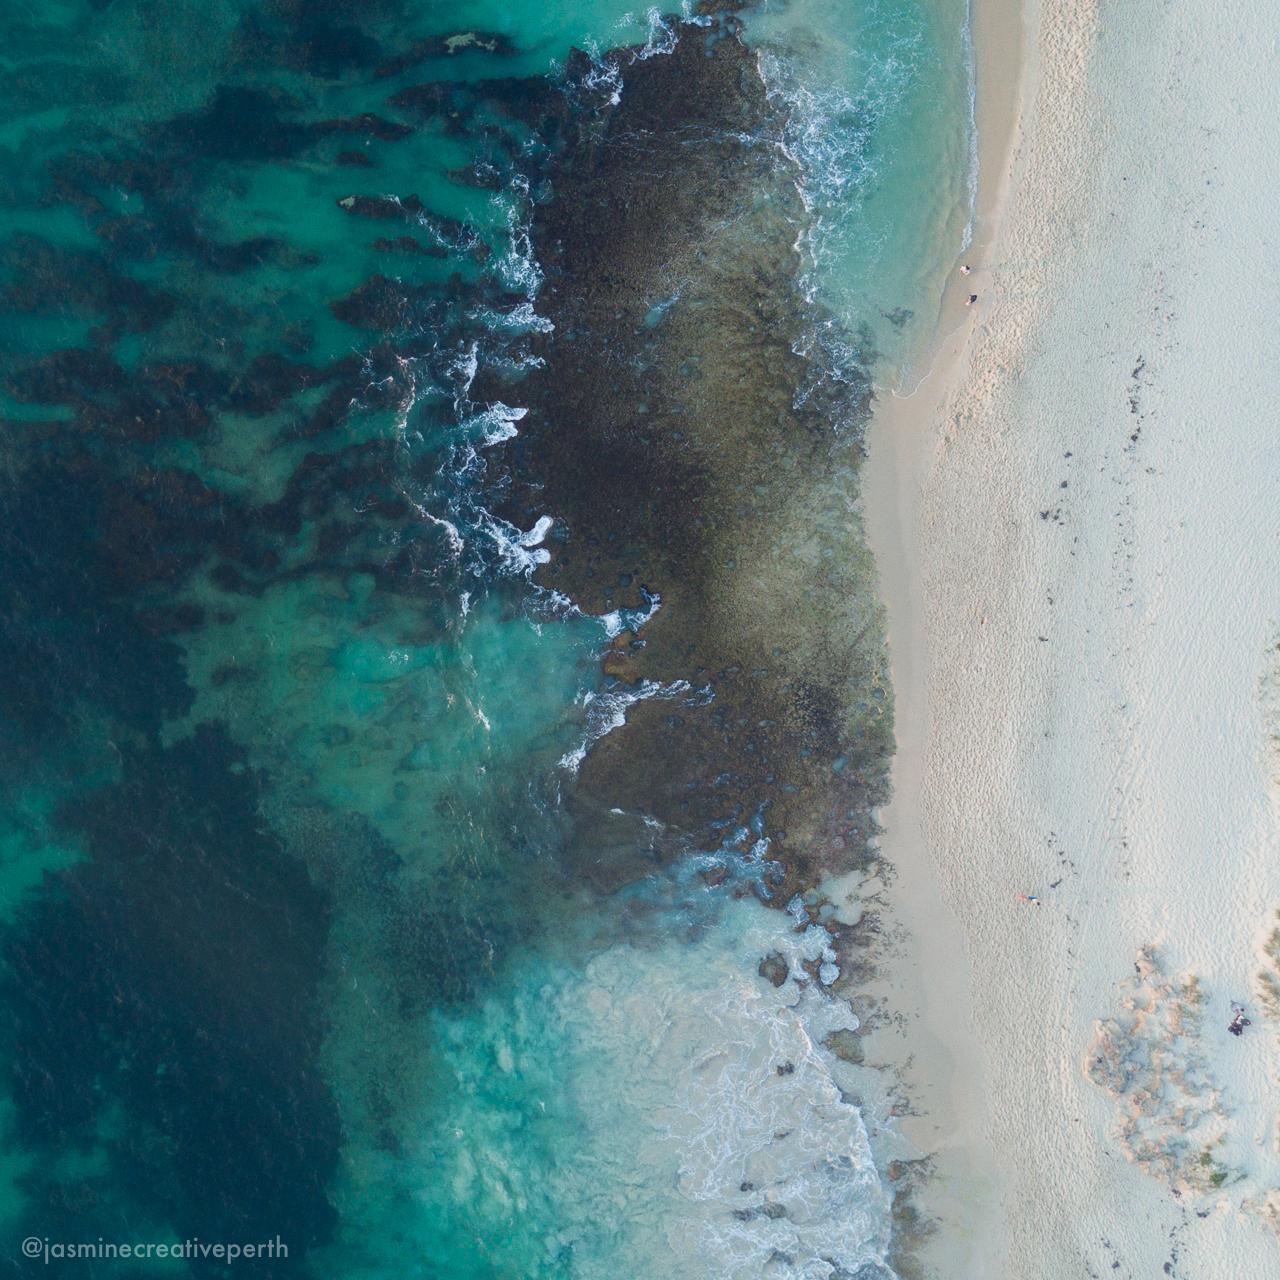 perth beach ocean aerial landscape photography jasmine creative body perth (6 of 11).jpg